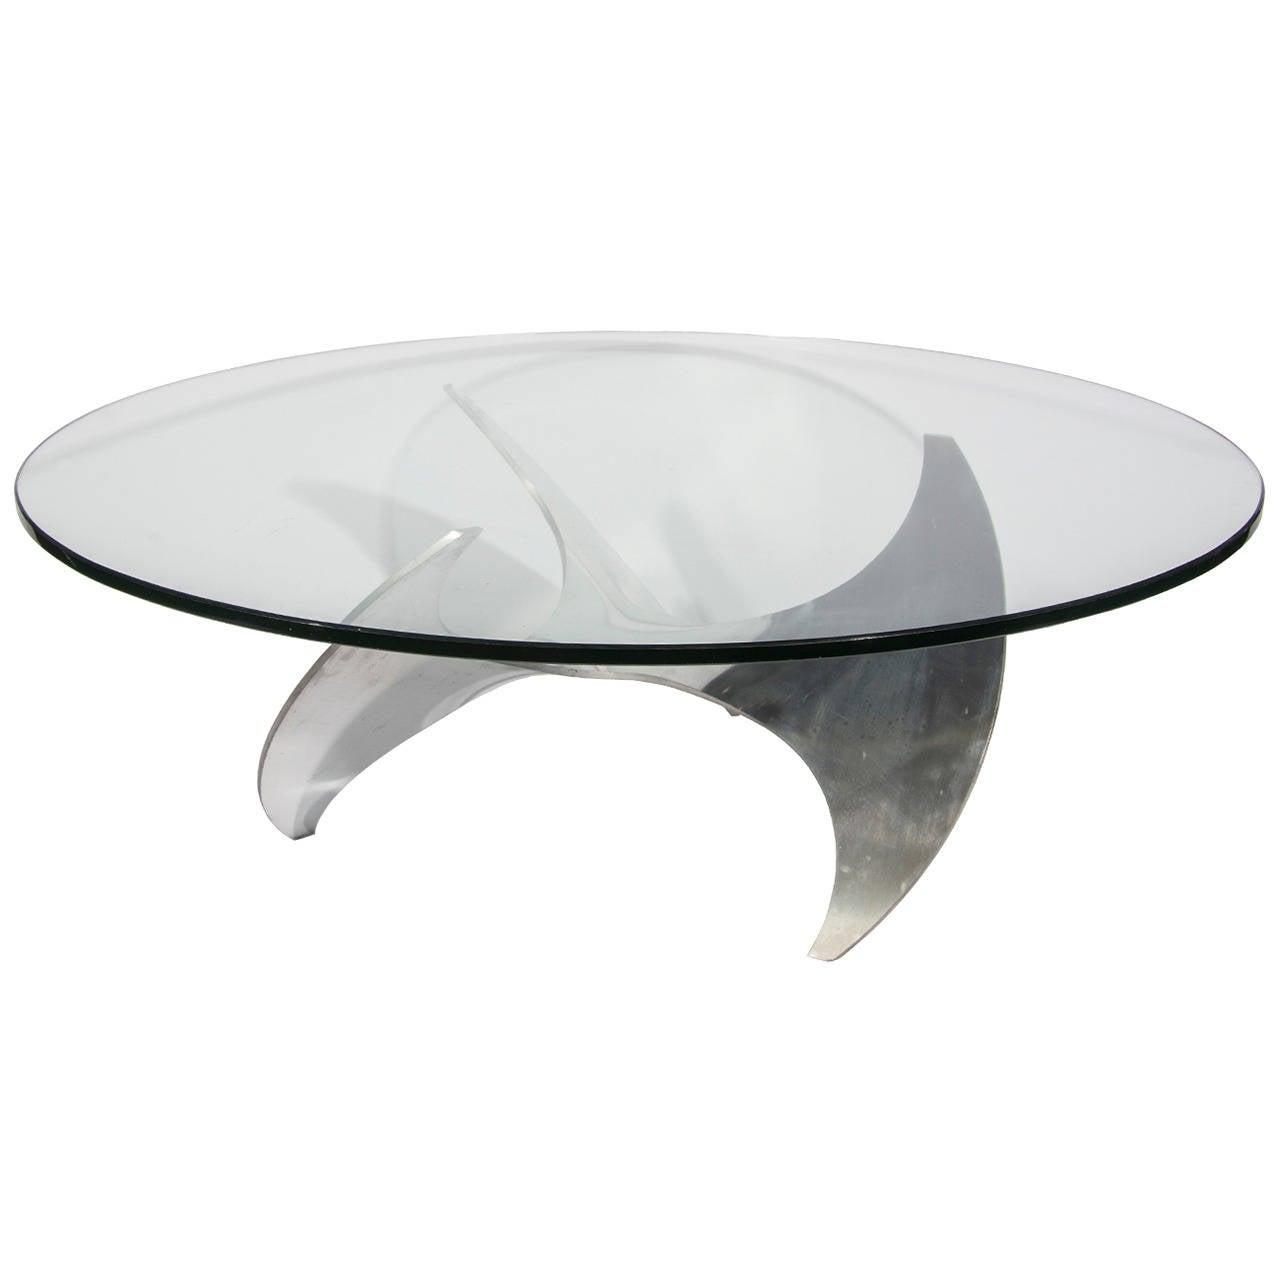 Knut Hesterberg Propeller Coffee Table At 1stdibs